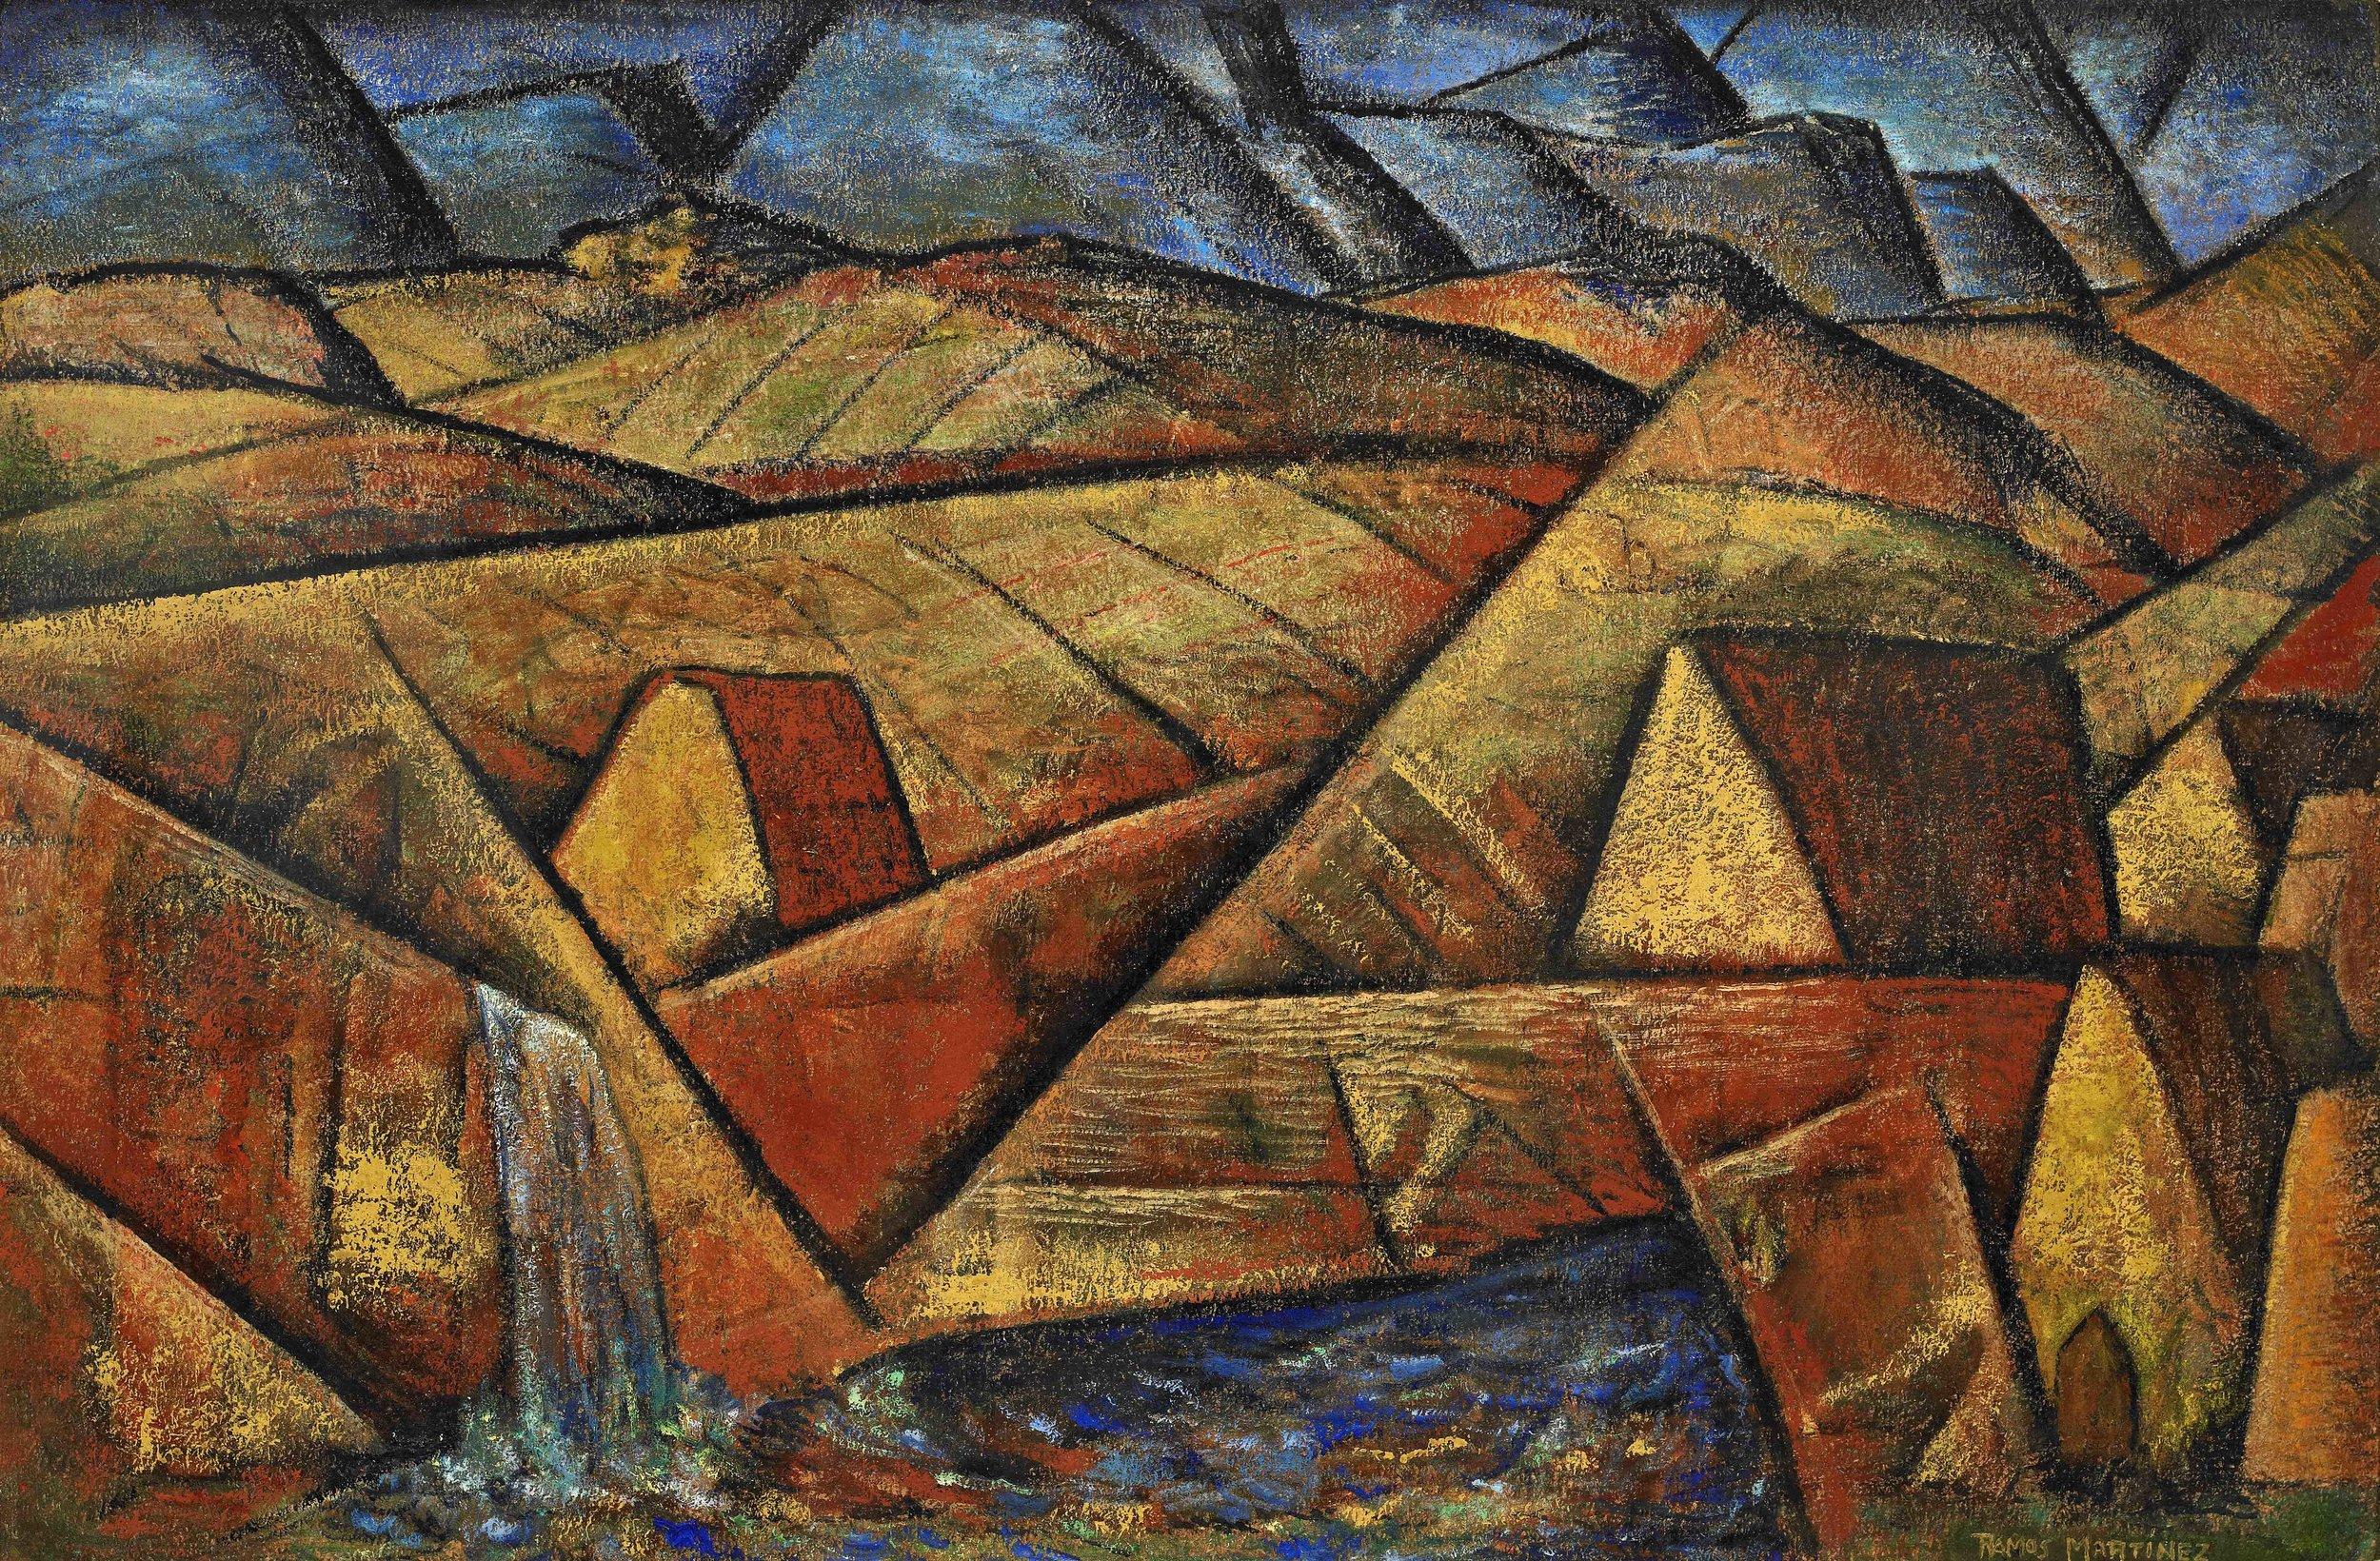 Lomas y Montañas / Hills and Mountains  1940 oil on board / óleo sobre tabla 23.5 x 35.5 inches; 59.7 x 90.2 centímetros Private collection